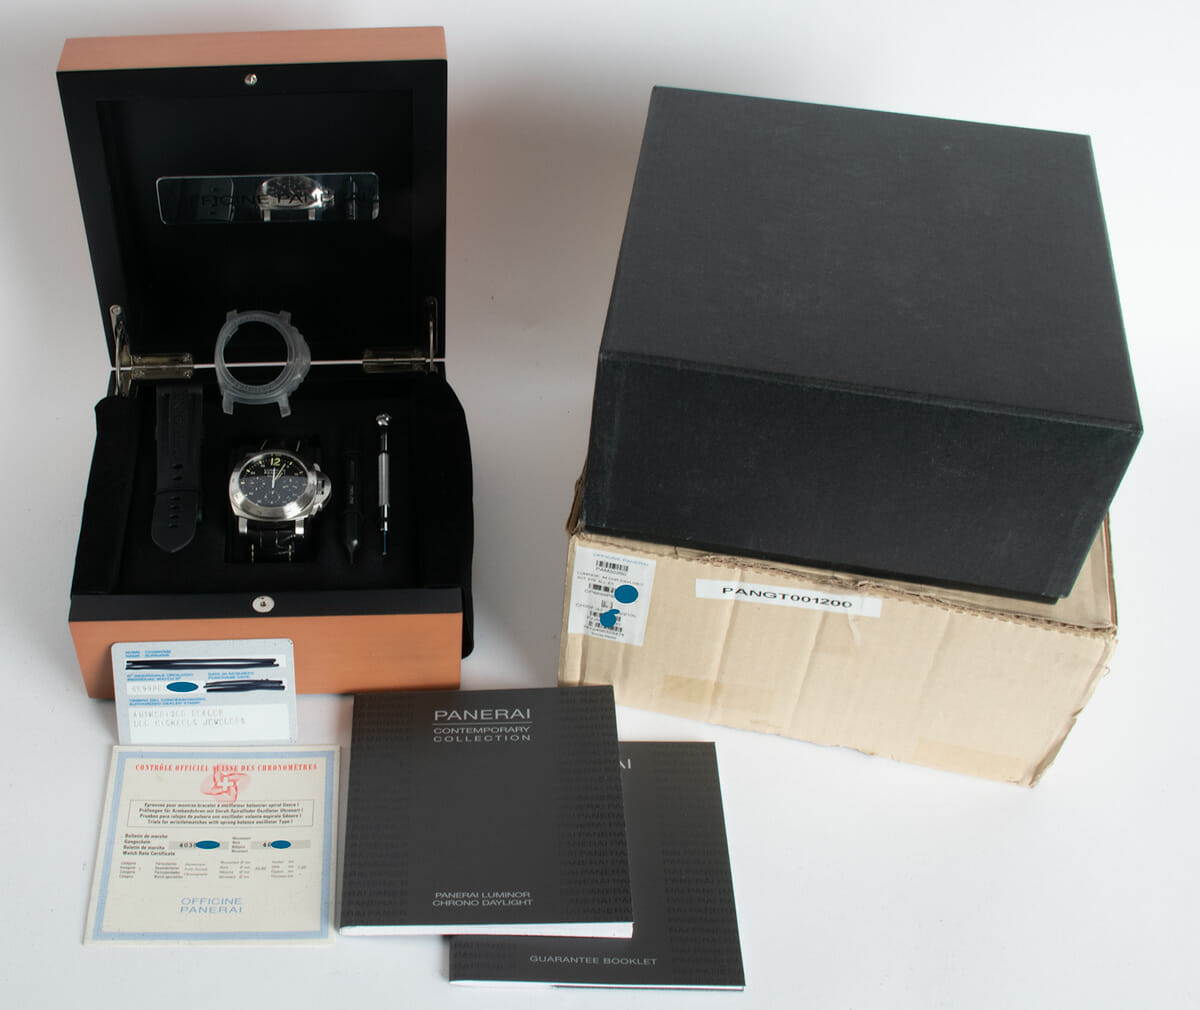 Box / Paper shot of Luminor Daylight Chronograph